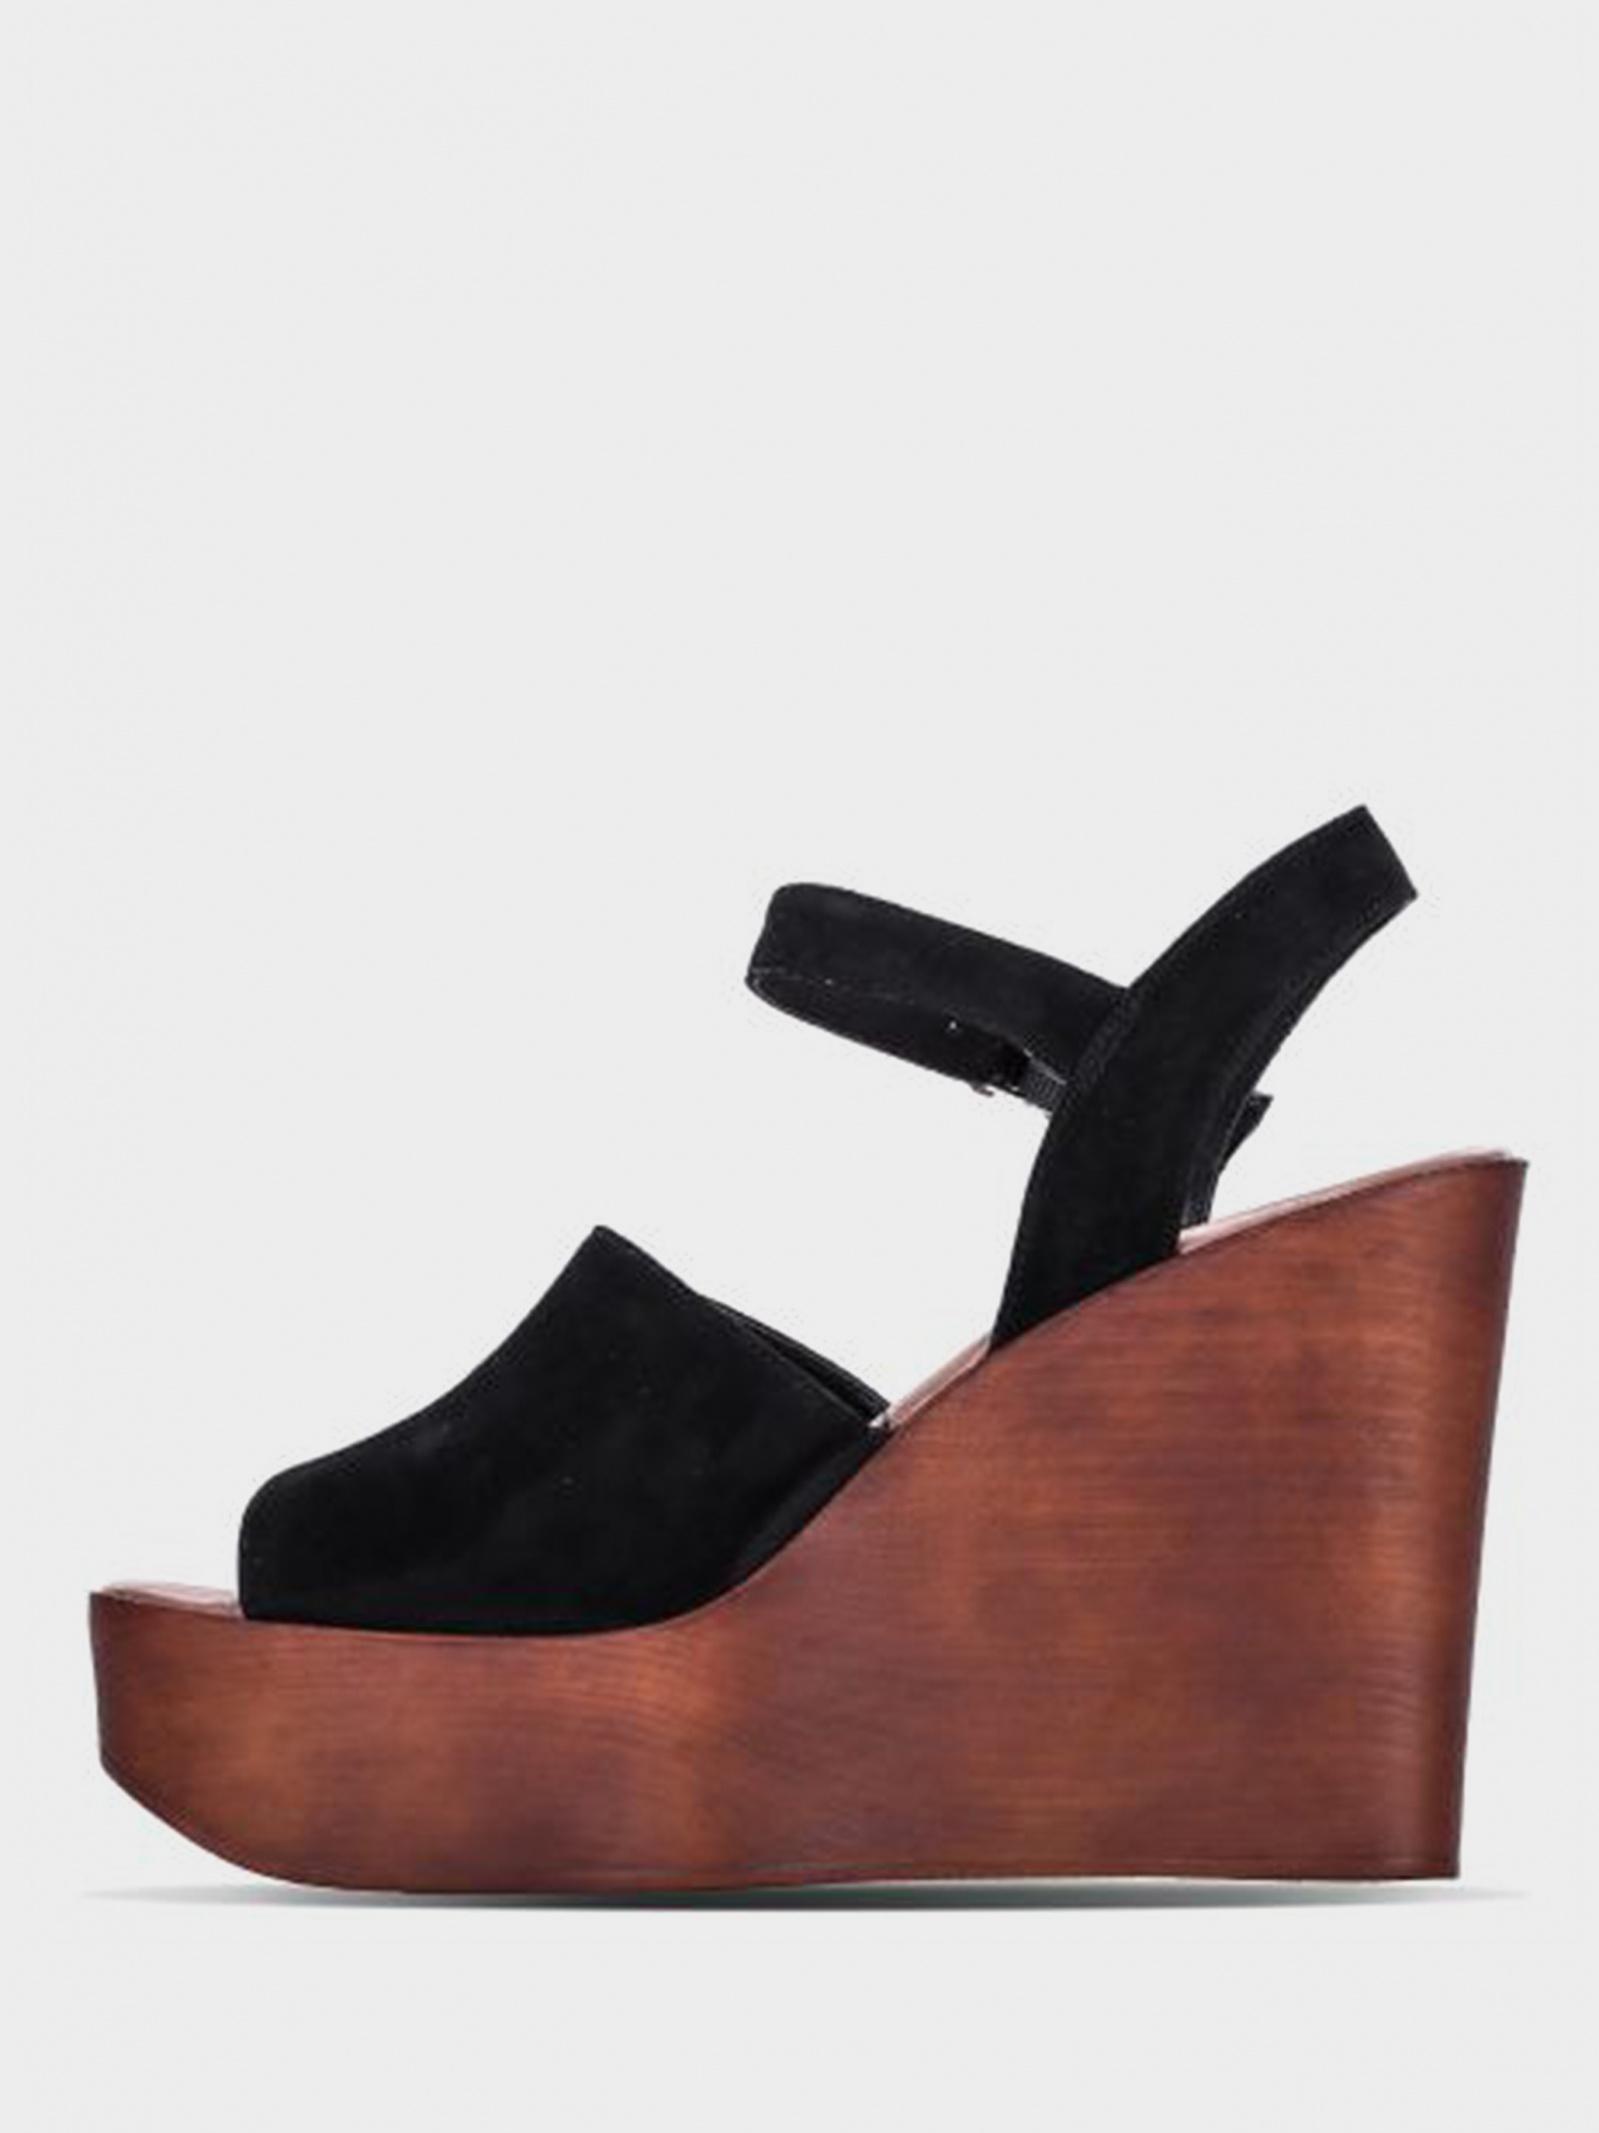 Босоніжки  для жінок Steve Madden BELLINI SM11000432 BLACK SUEDE ціна, 2017